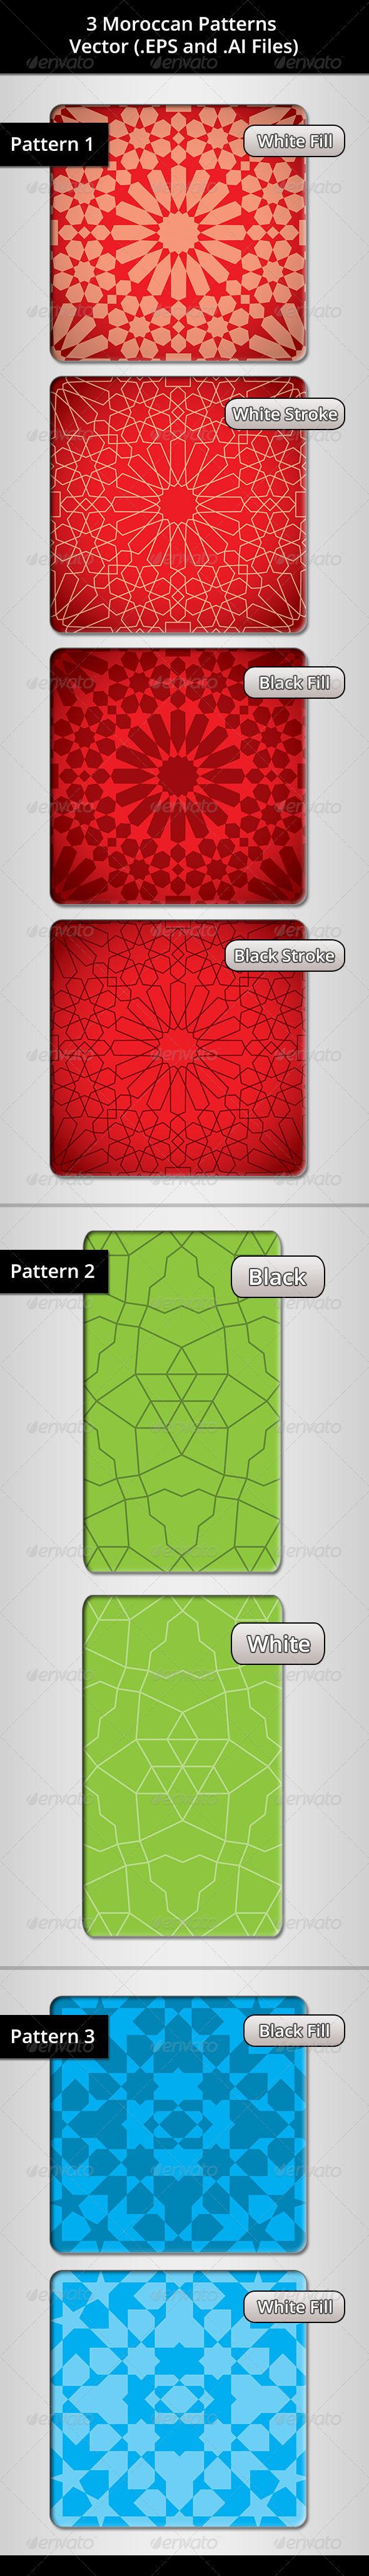 GraphicRiver 3 Moroccan Patterns Bundle 7048284